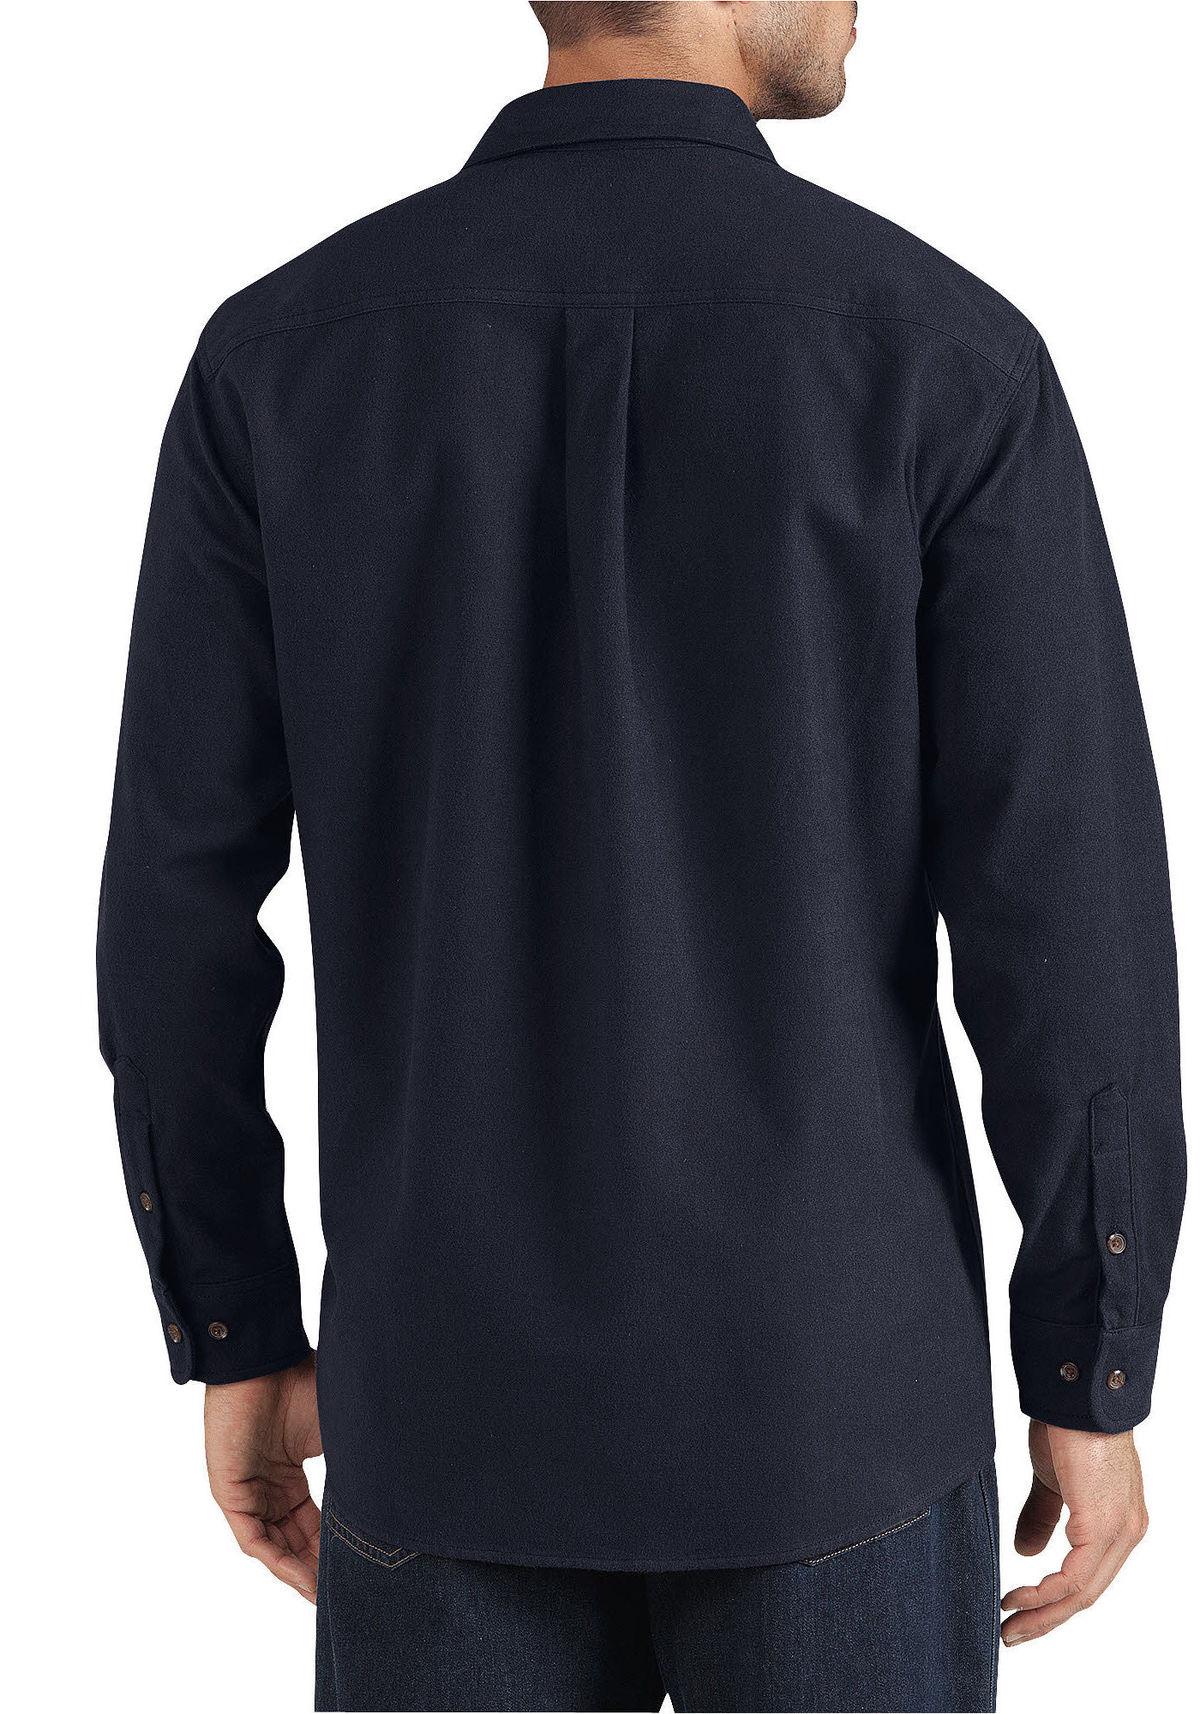 Dickies WL633 Long Sleeve Chamois Shirt | eBay